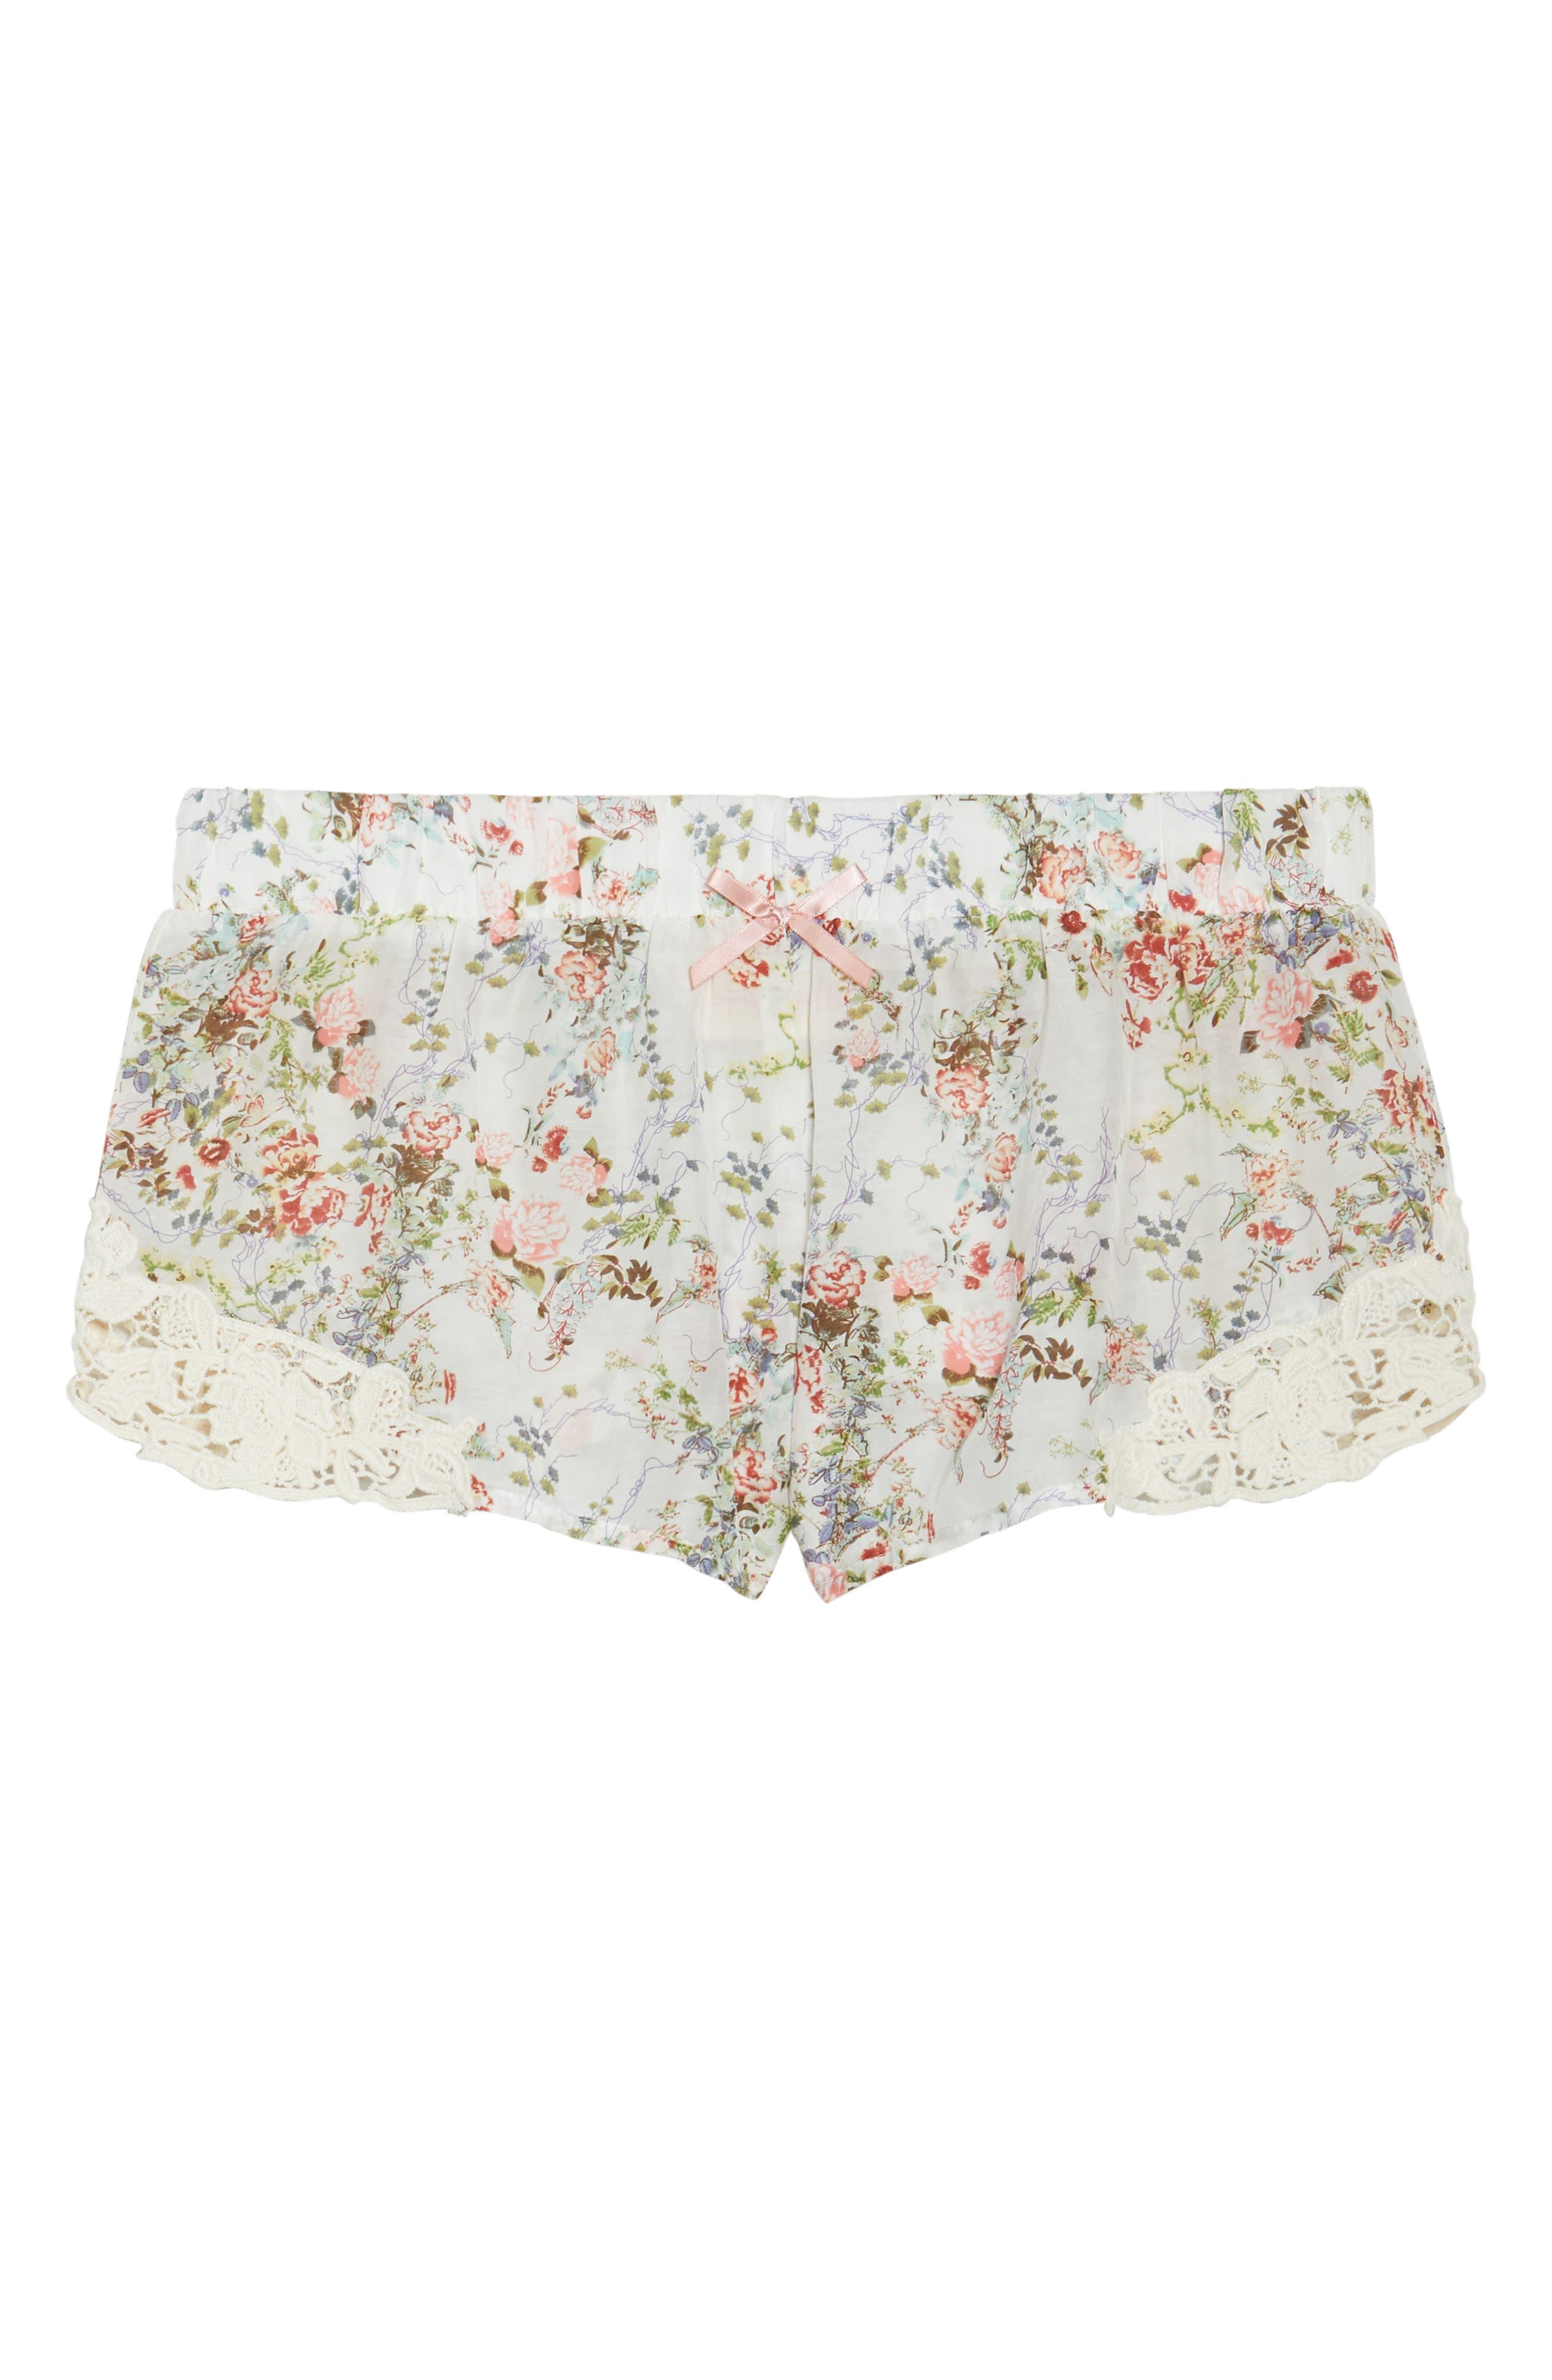 Yolly Floral Pajama Shorts,                             Alternate thumbnail 6, color,                             IVORY FLORAL